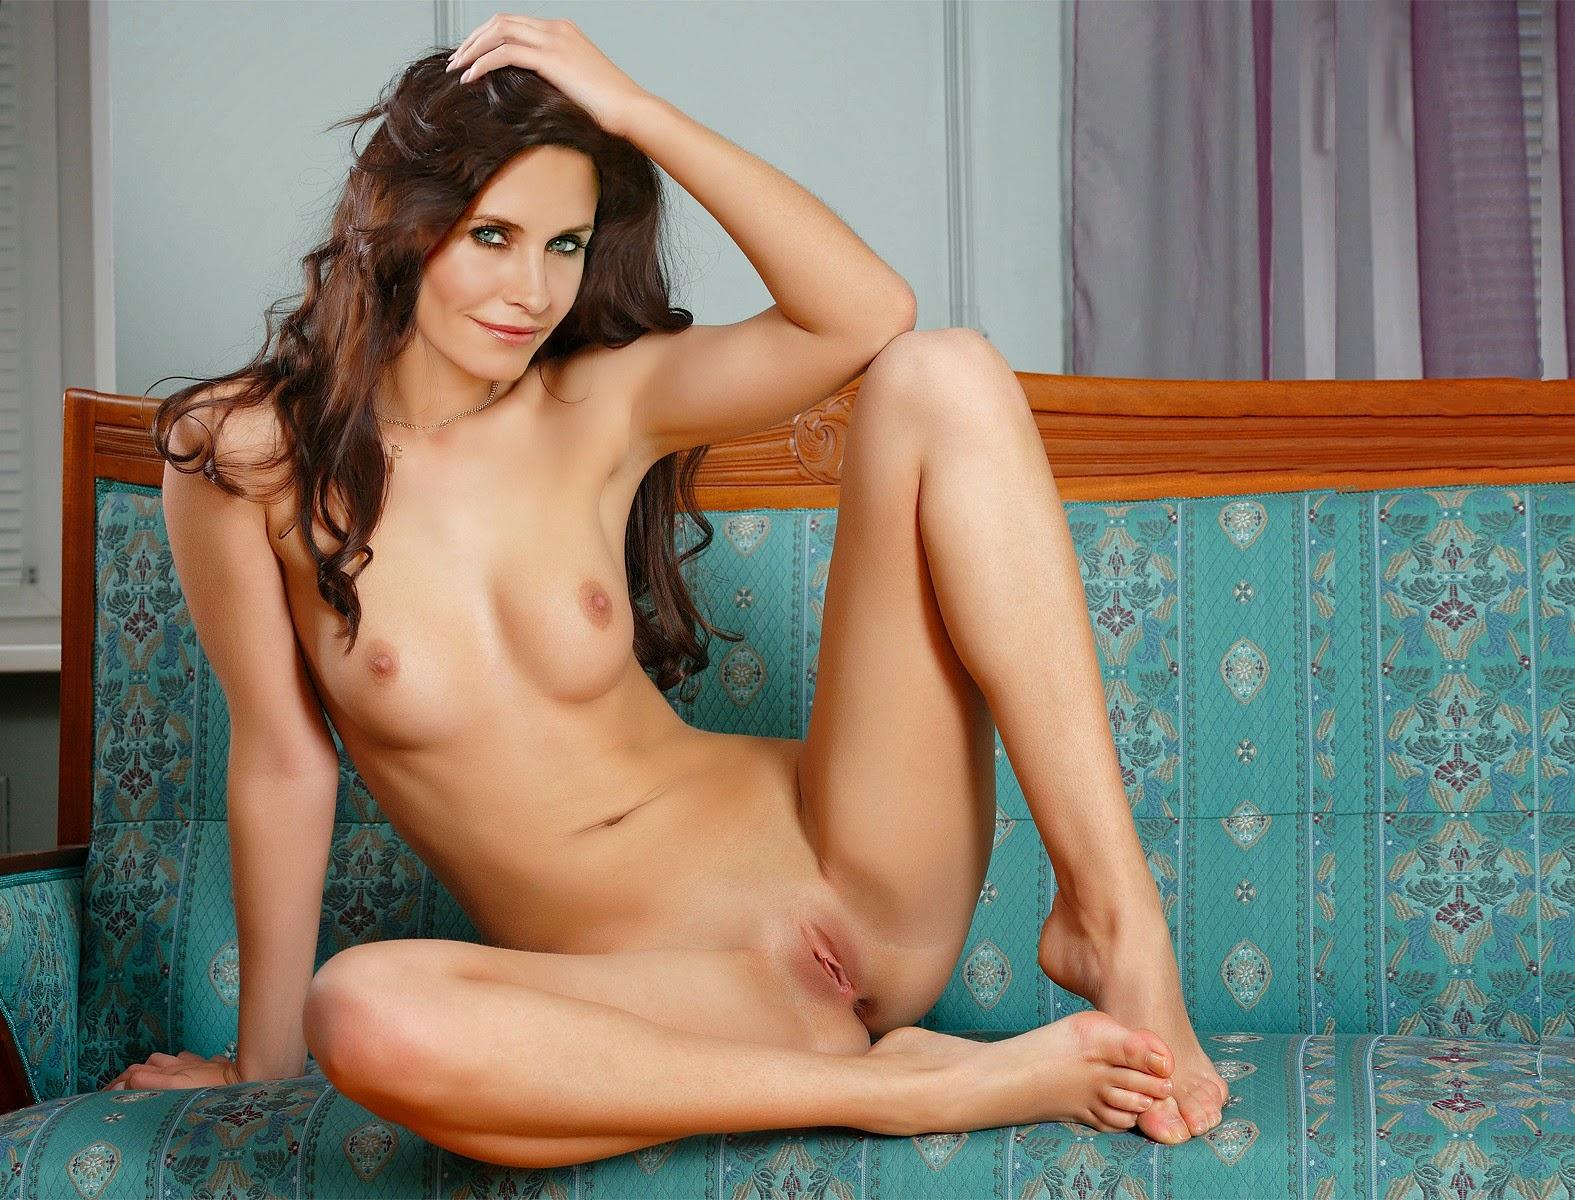 Lewandowsky recommends German nude pics